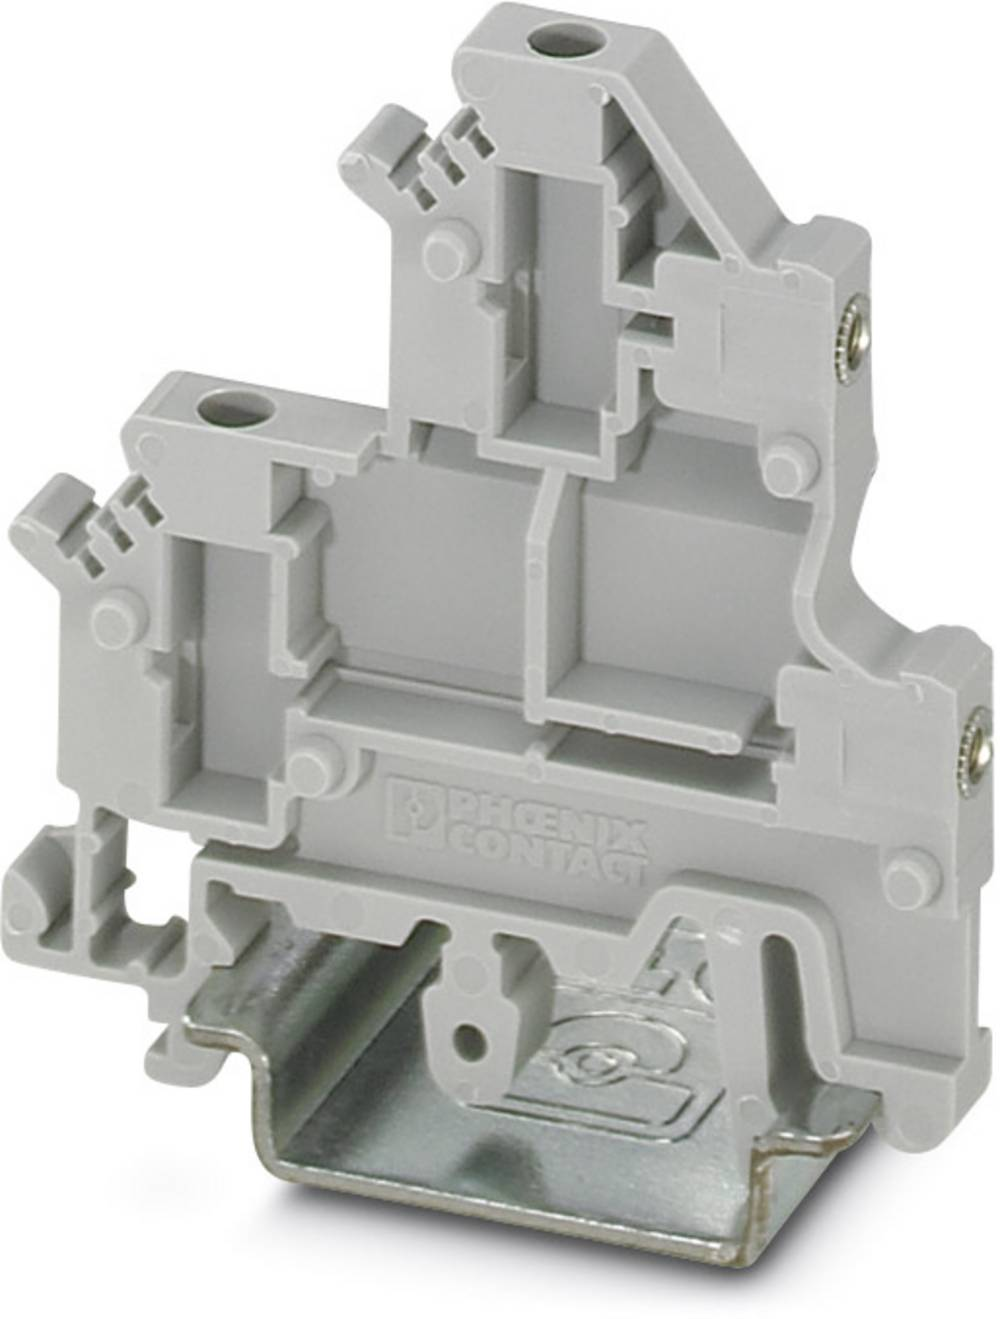 Double-level flange terminal block UKK 3-MSTB-5,08-F Phoenix Contact UKK 3-MSTB-5,08-F Grå 50 stk